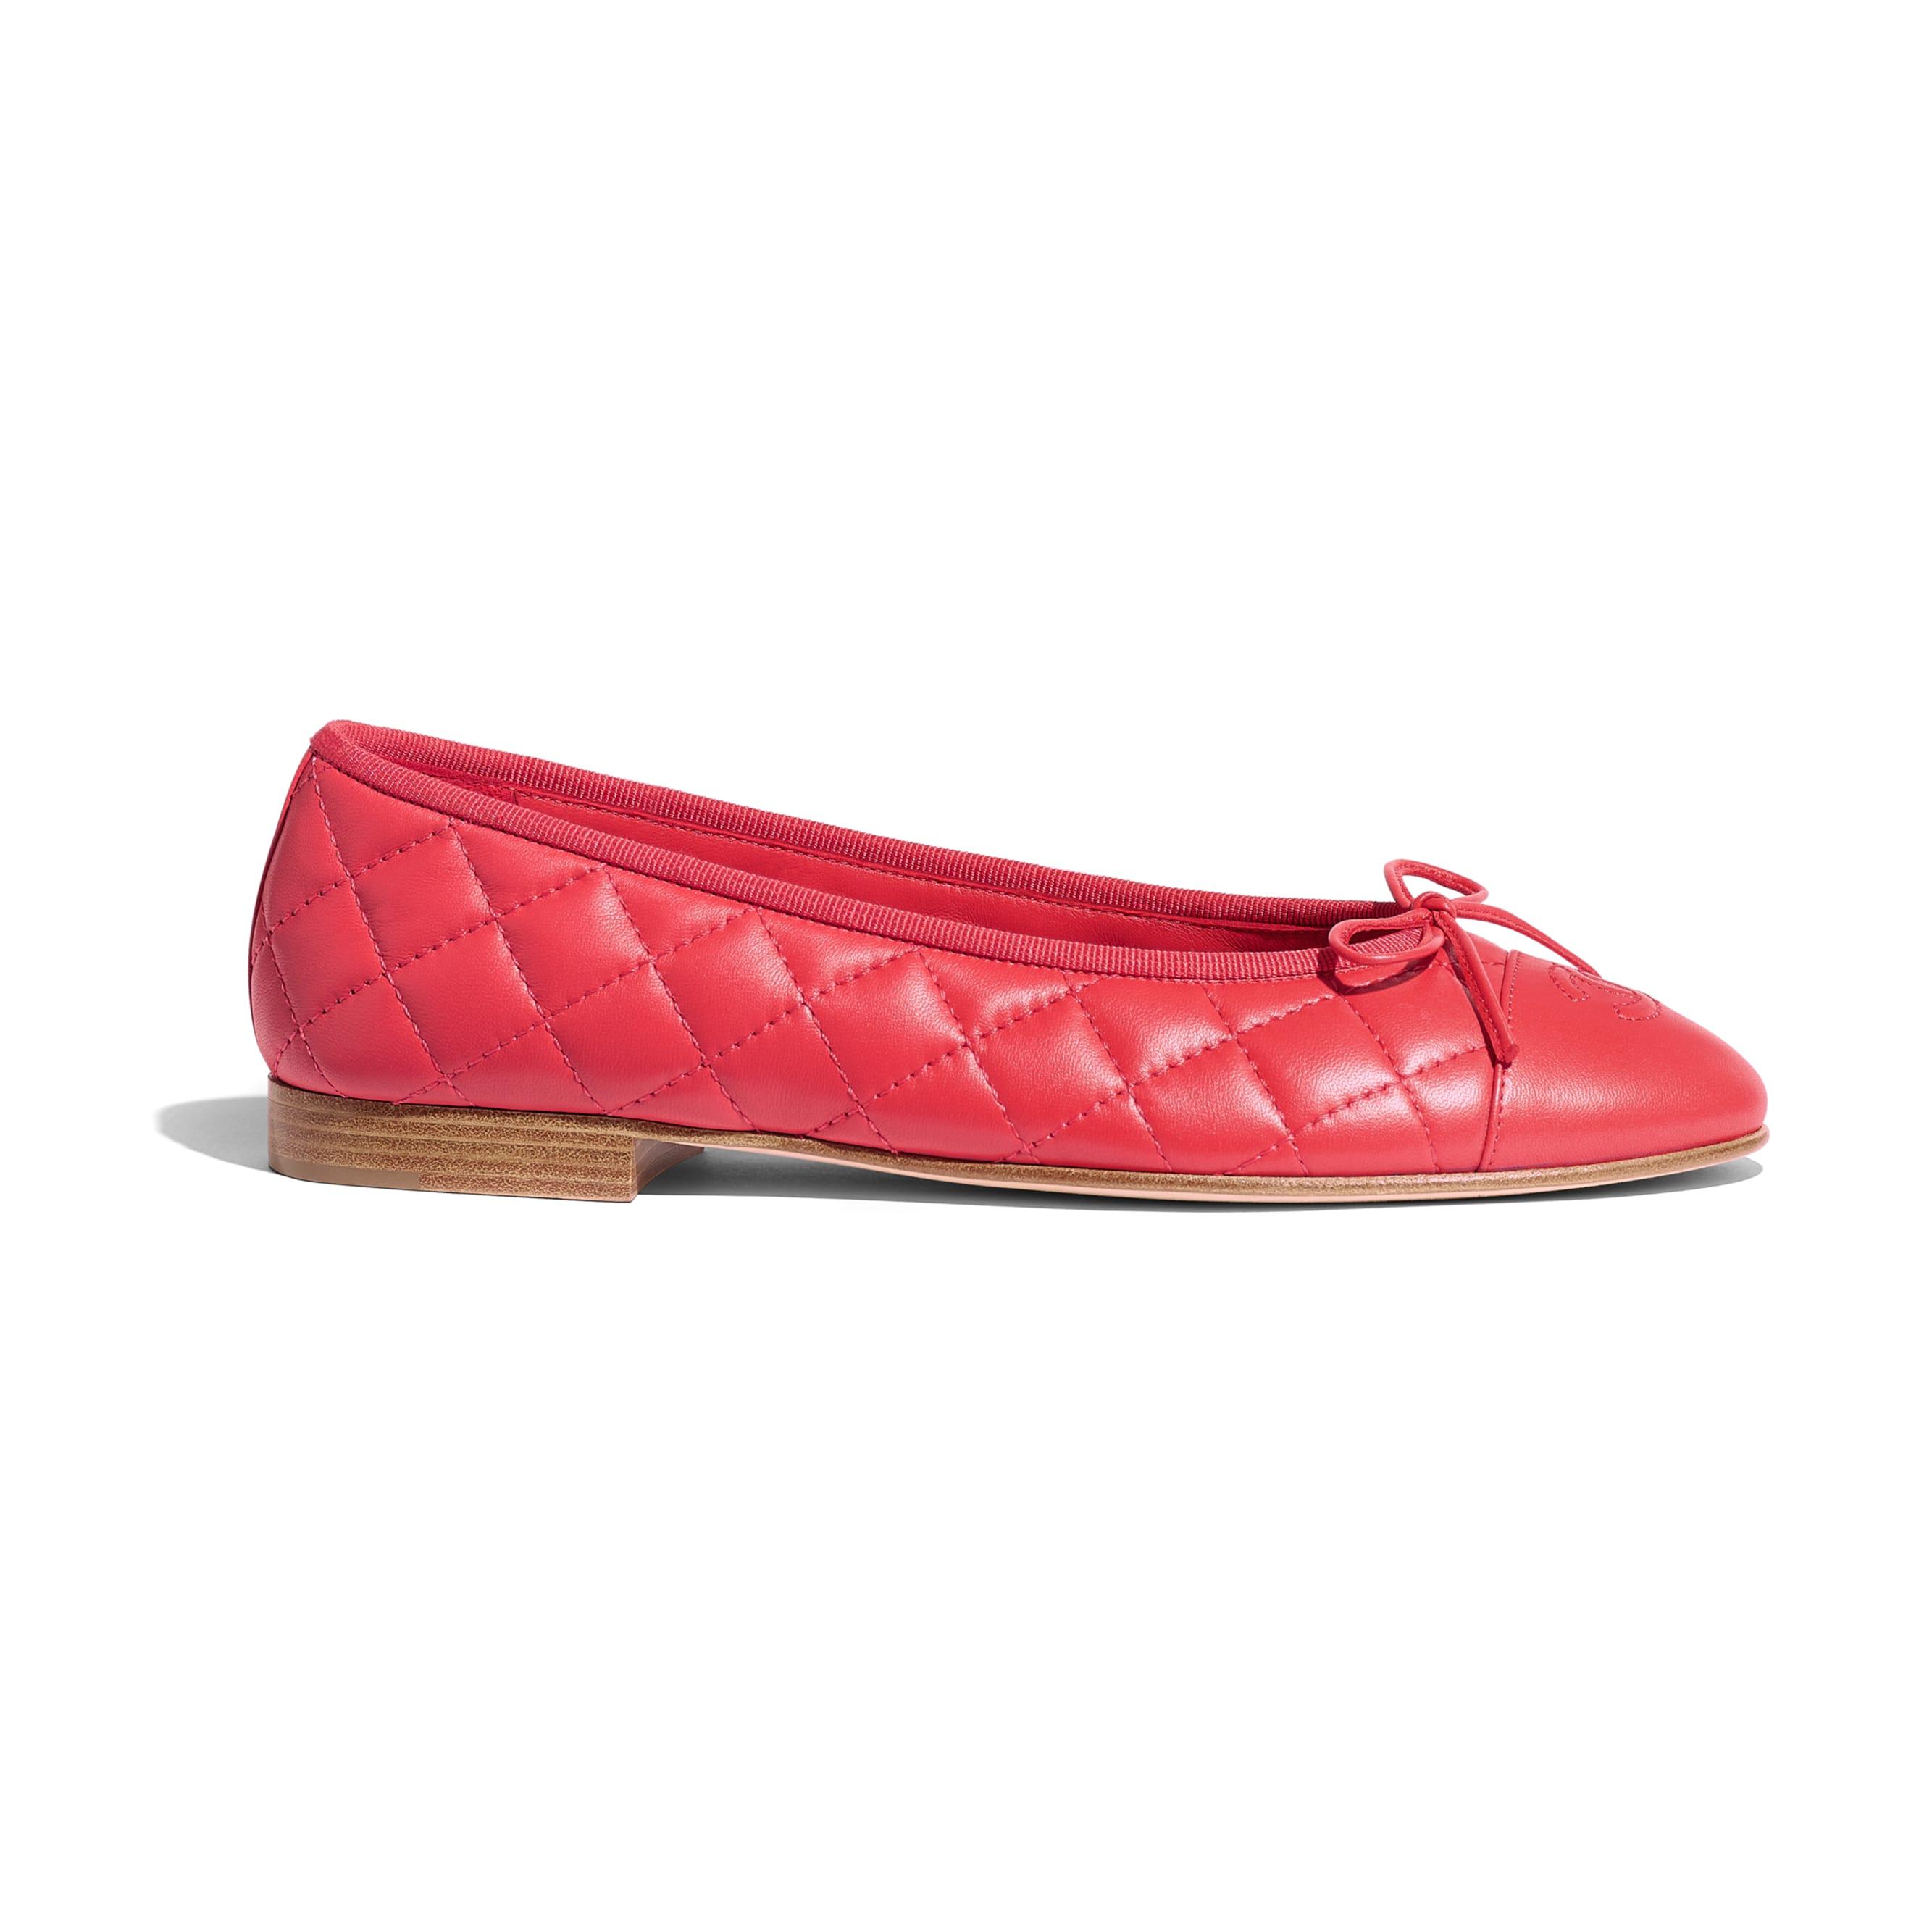 Ballerinas - Red - Lambskin - Default view - see standard sized version